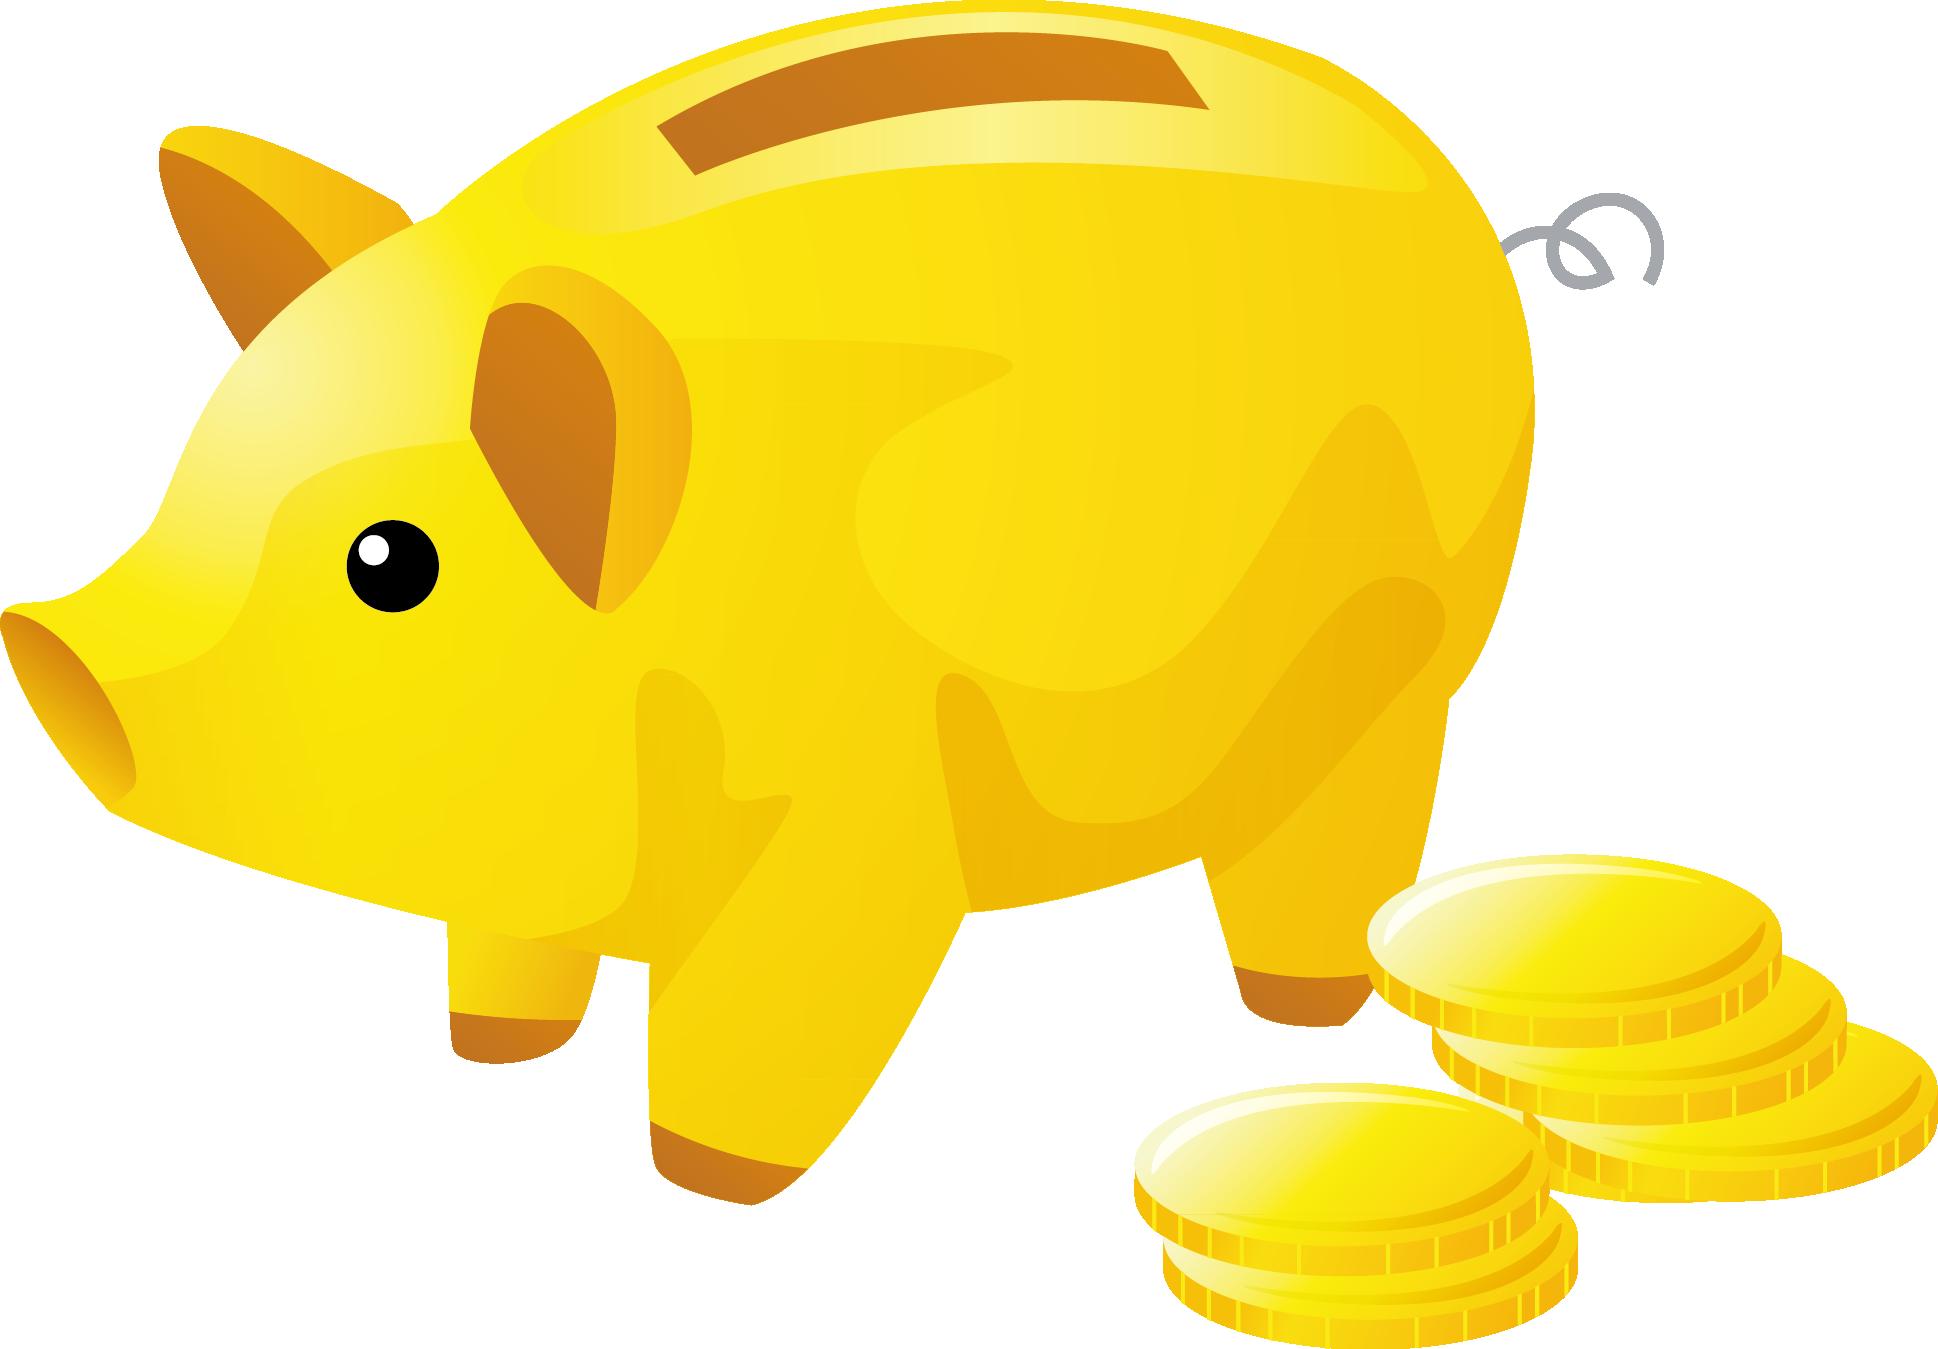 Piggy bank clipart free clip art freeuse stock Piggy bank Clip art - Piggy piggy bank 1938*1349 transprent Png Free ... clip art freeuse stock